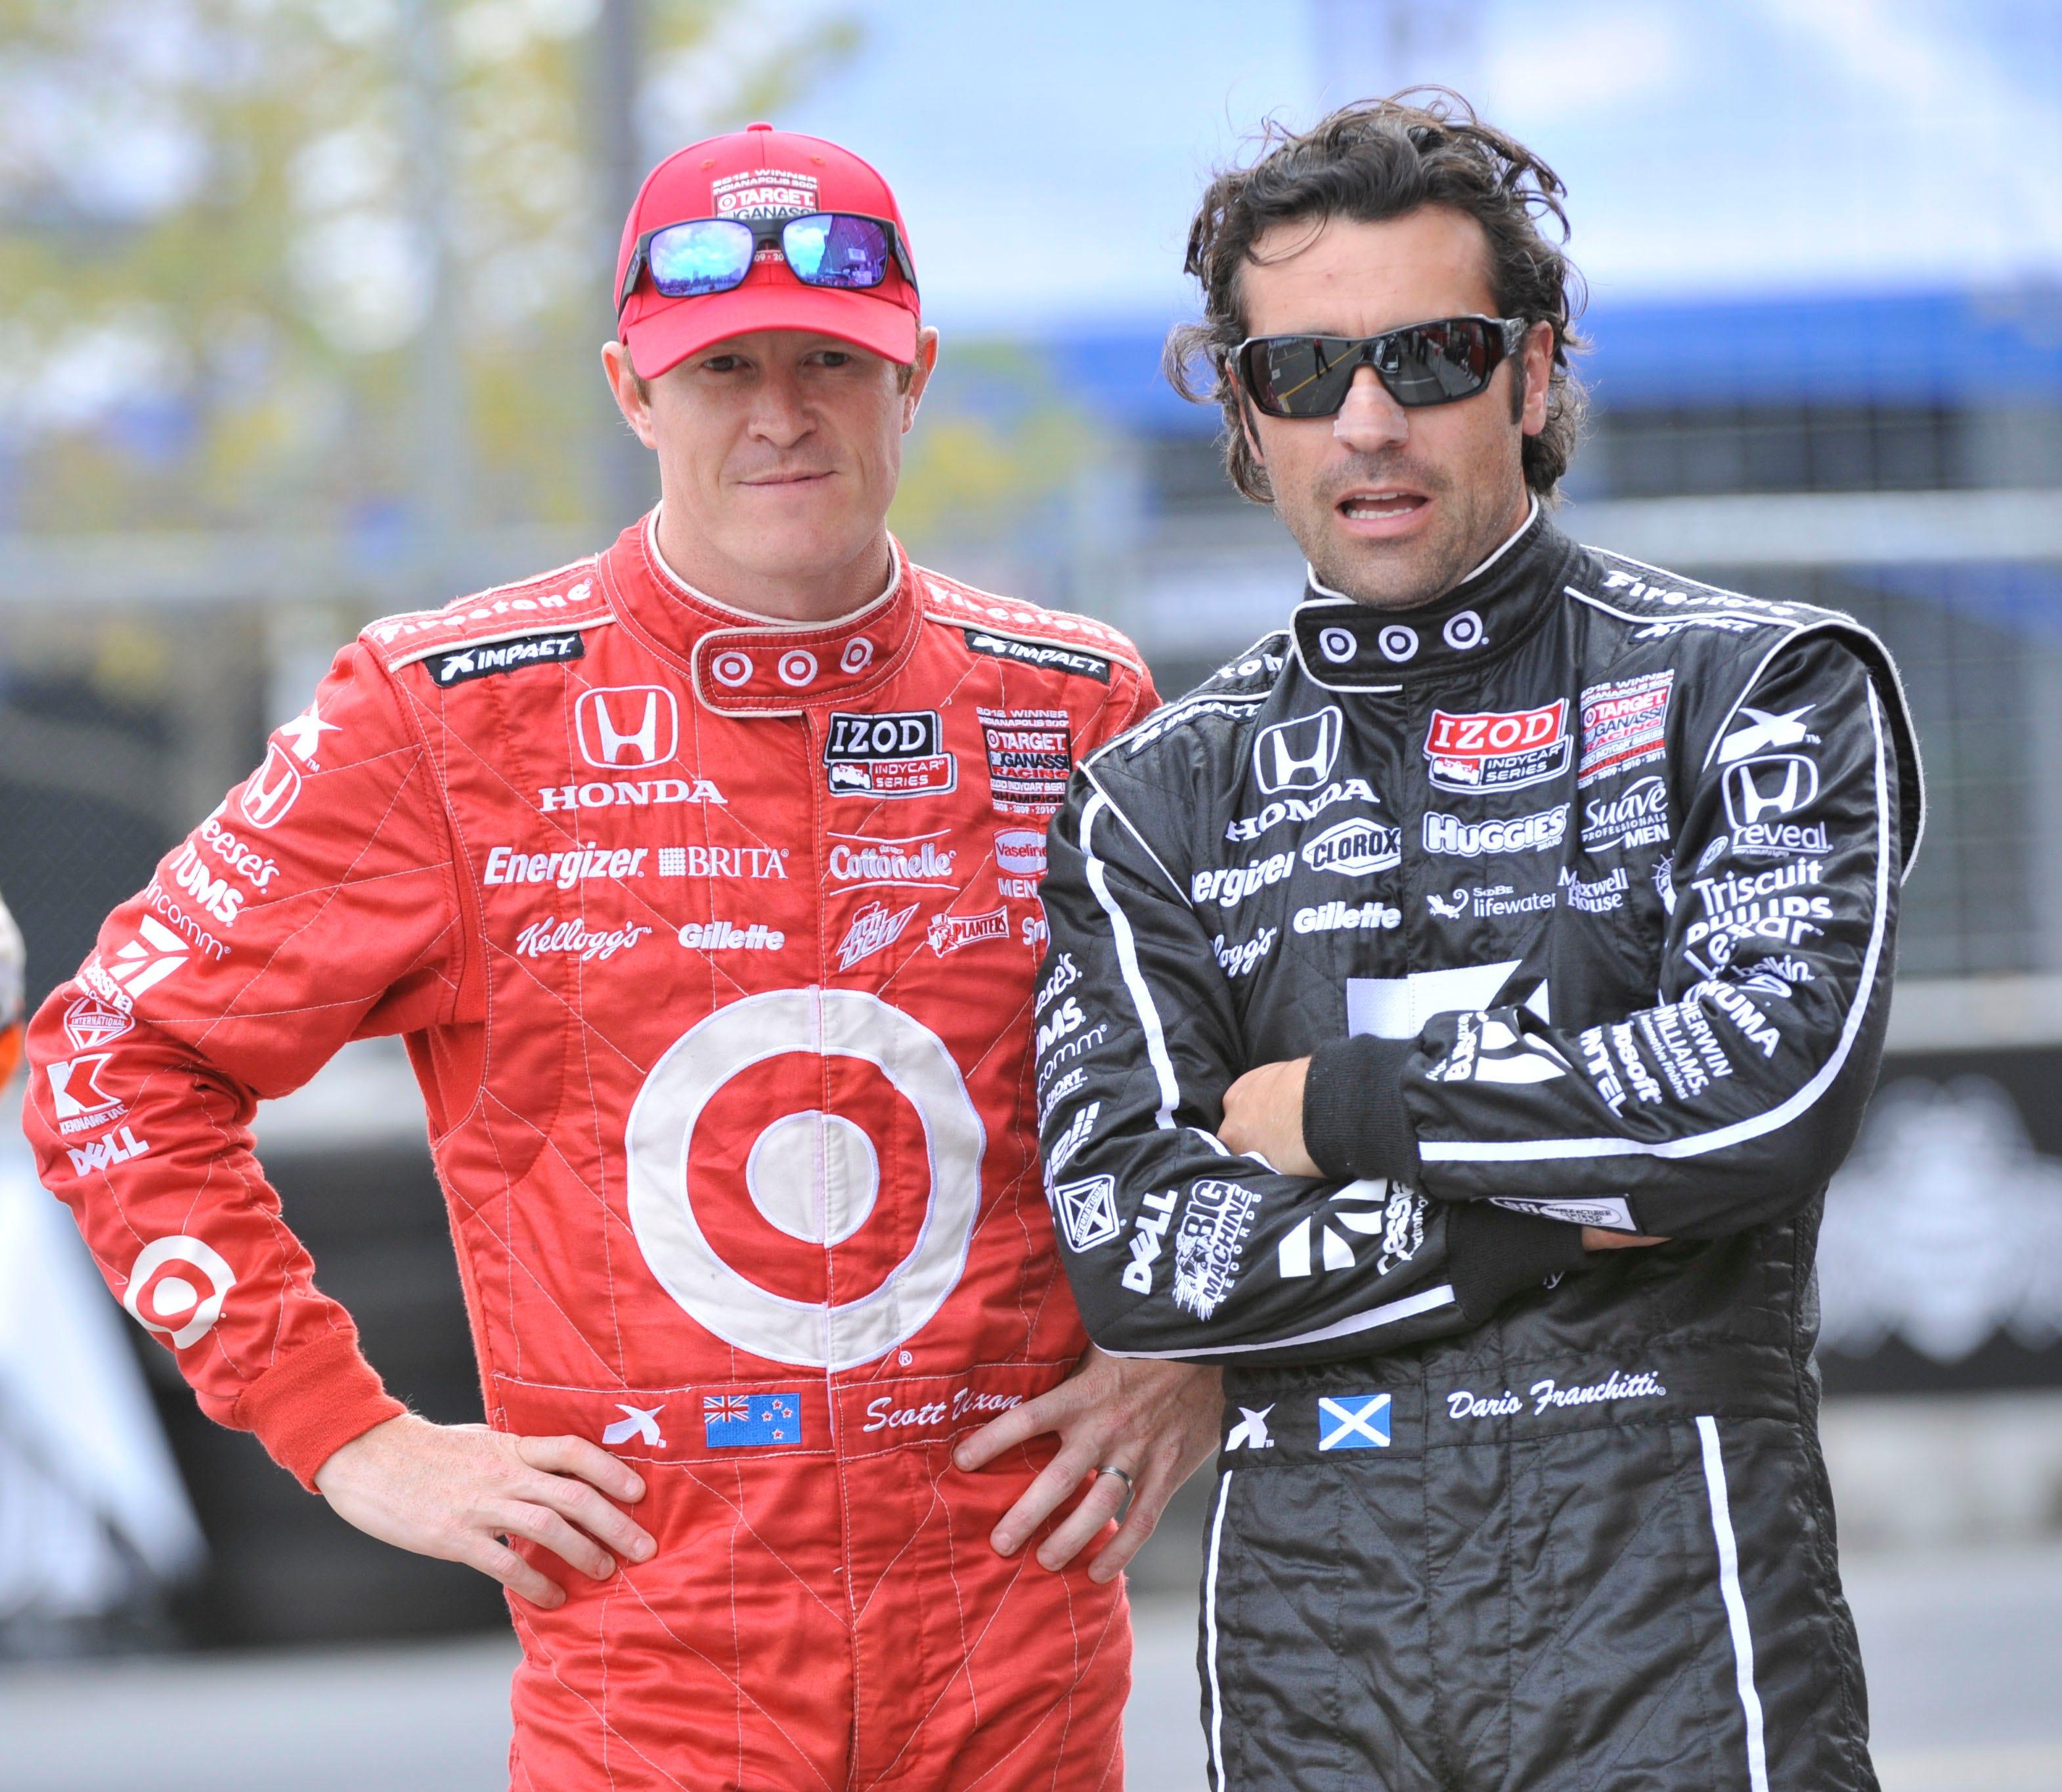 636310473017637909-USCP-DIXON-DARIO-58053226 IndyCar driver Scott Dixon, retired racer Dario Franchitti robbed at Taco Bell